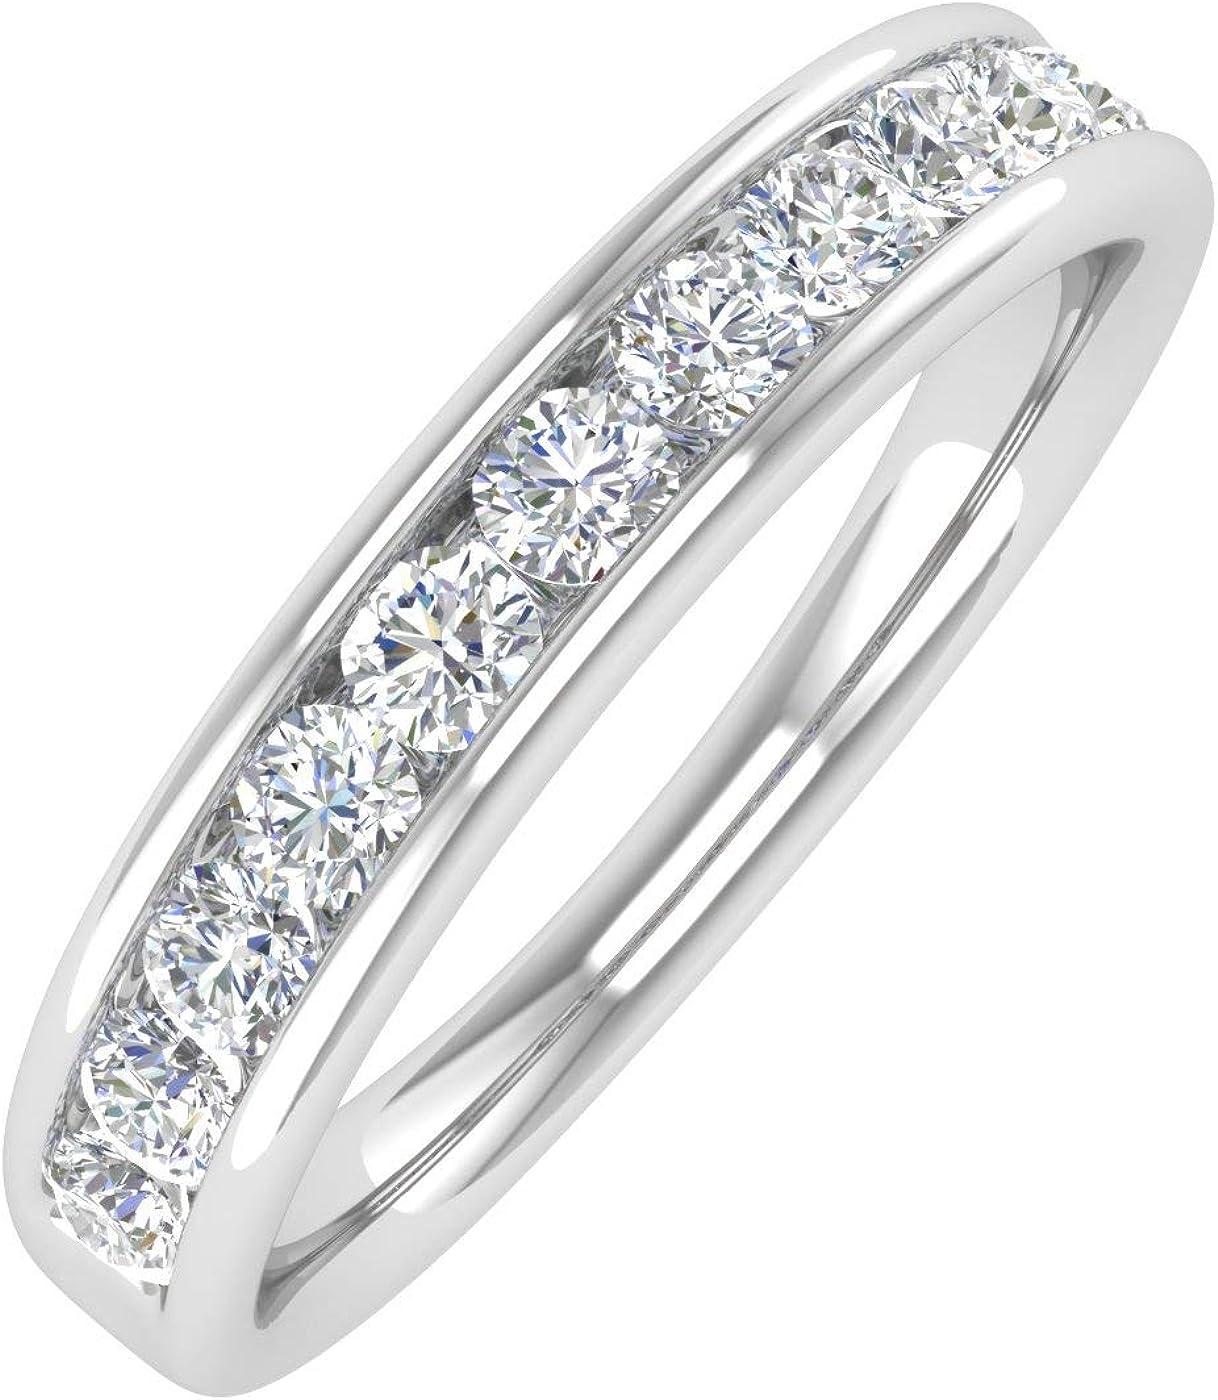 1/2 Carat to 1 Carat Channel Set Diamond Wedding Band Ring in 14K White Gold